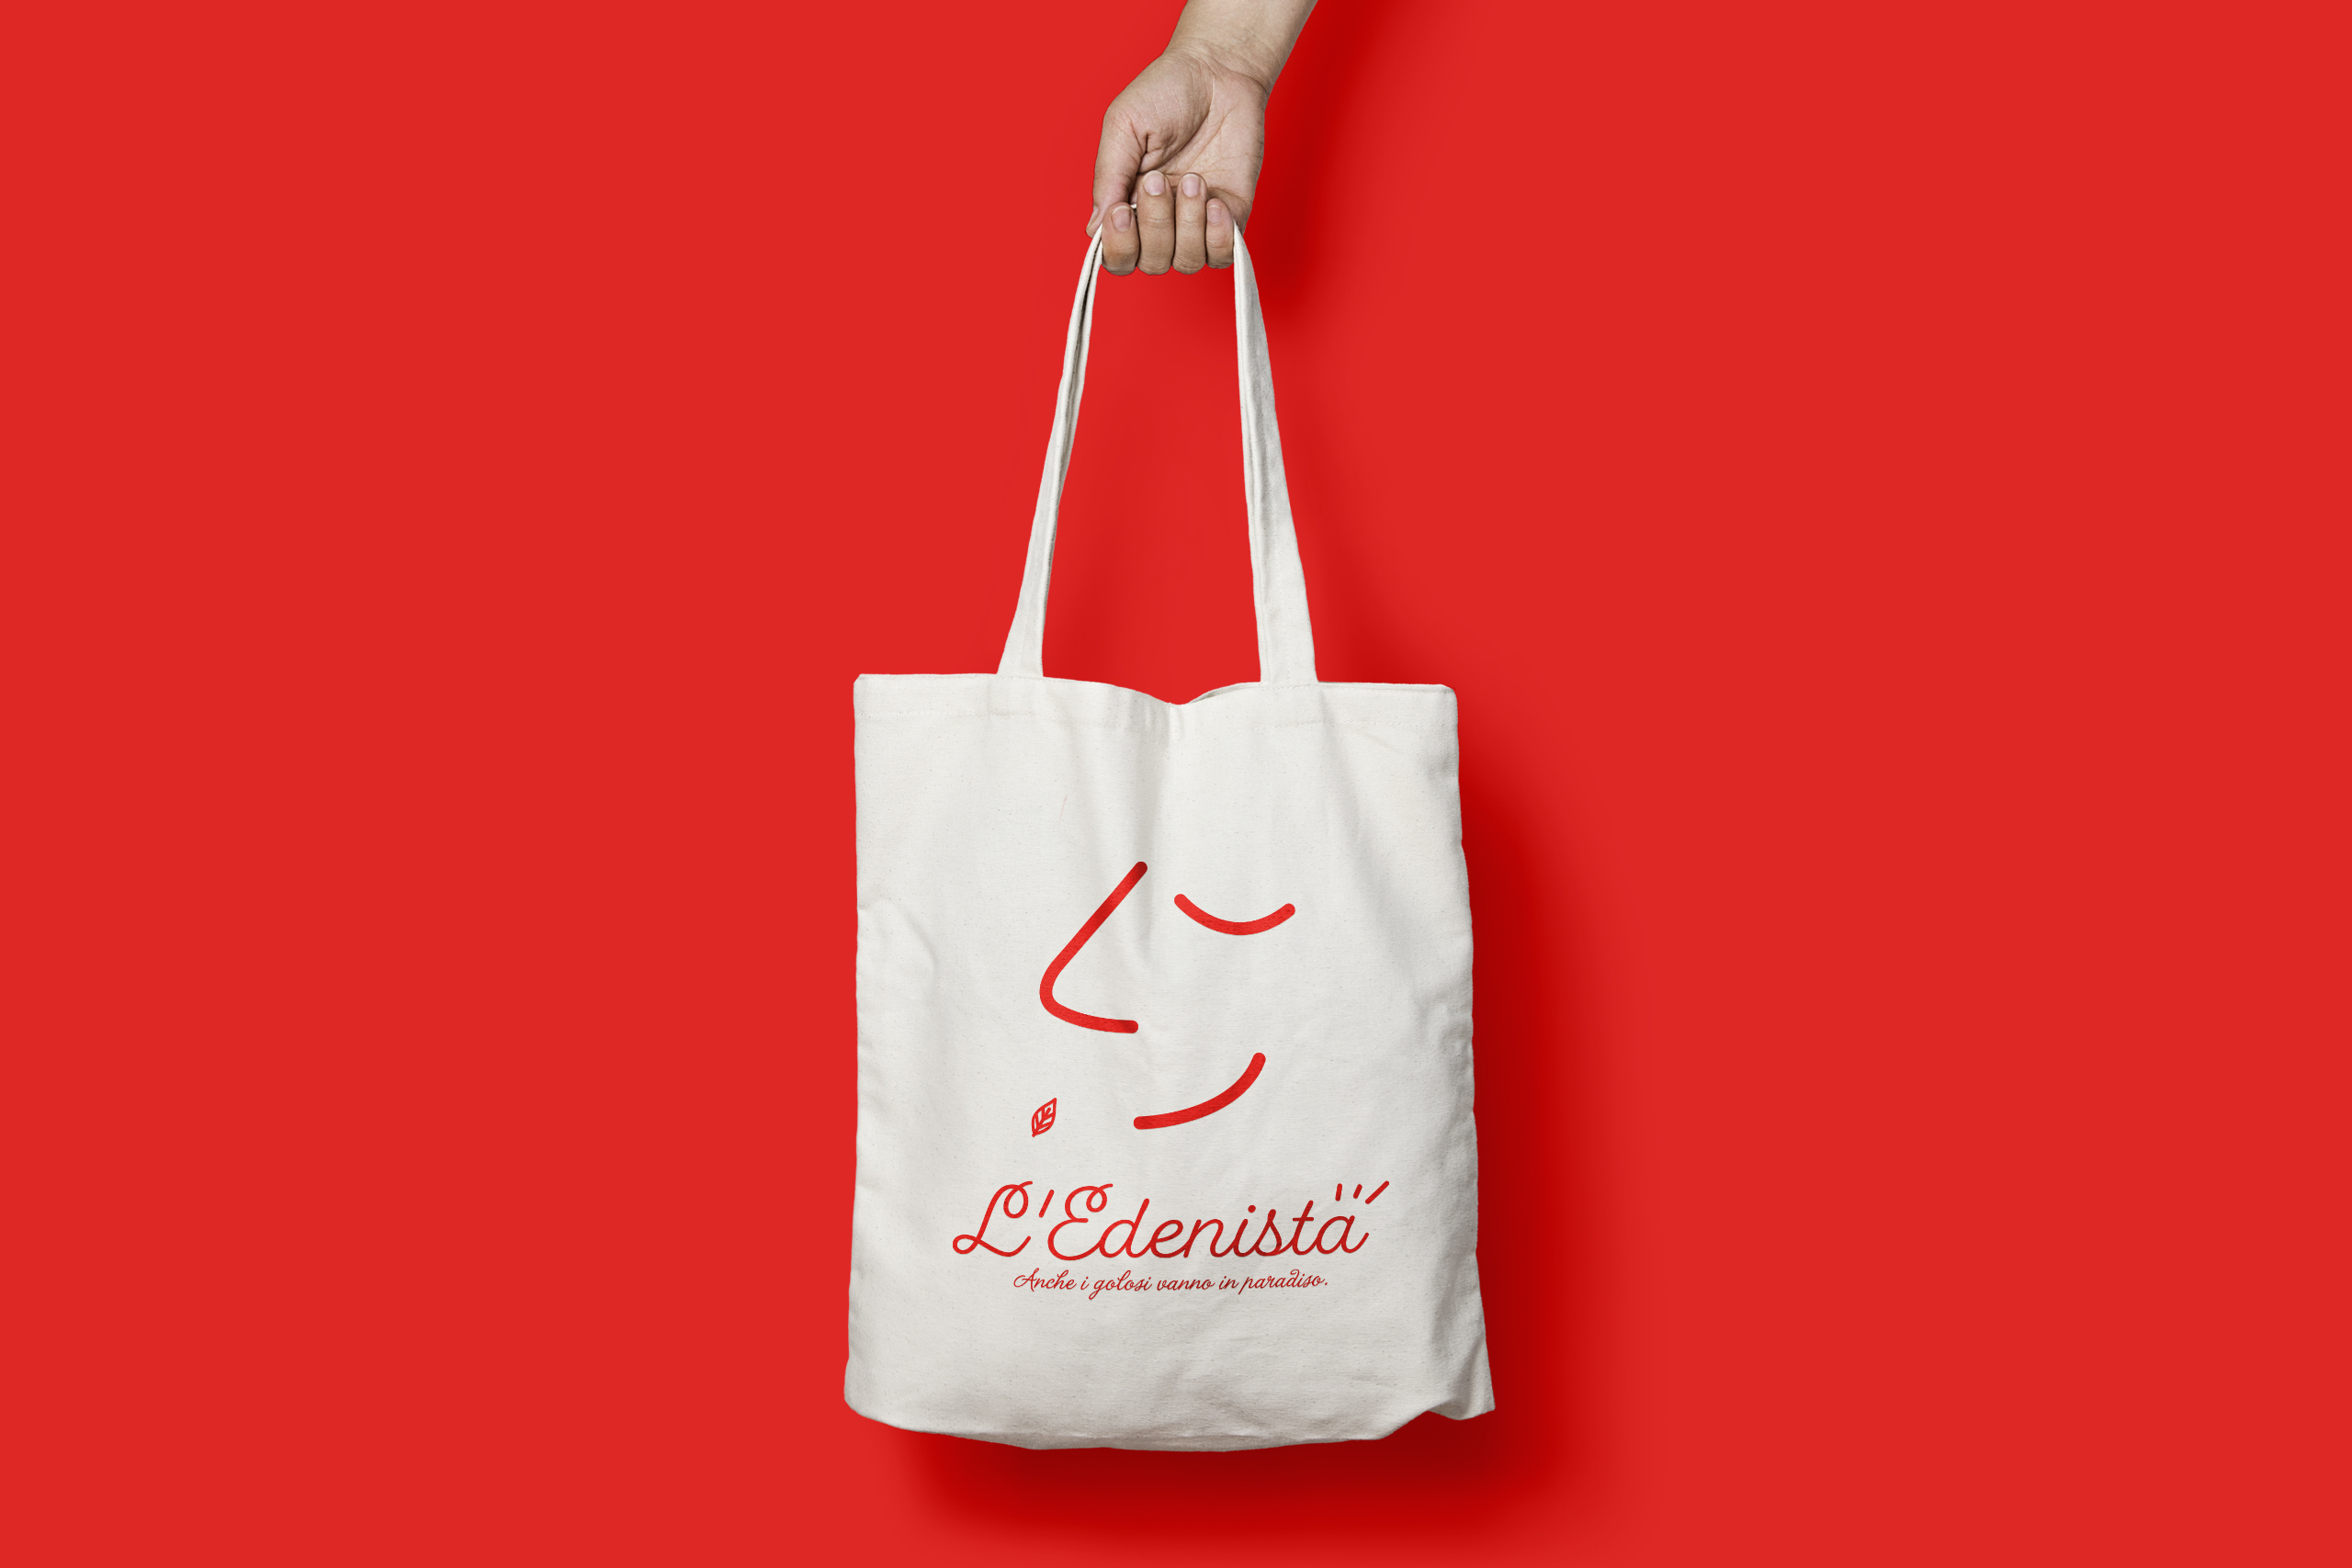 Edenista_shoppingbag